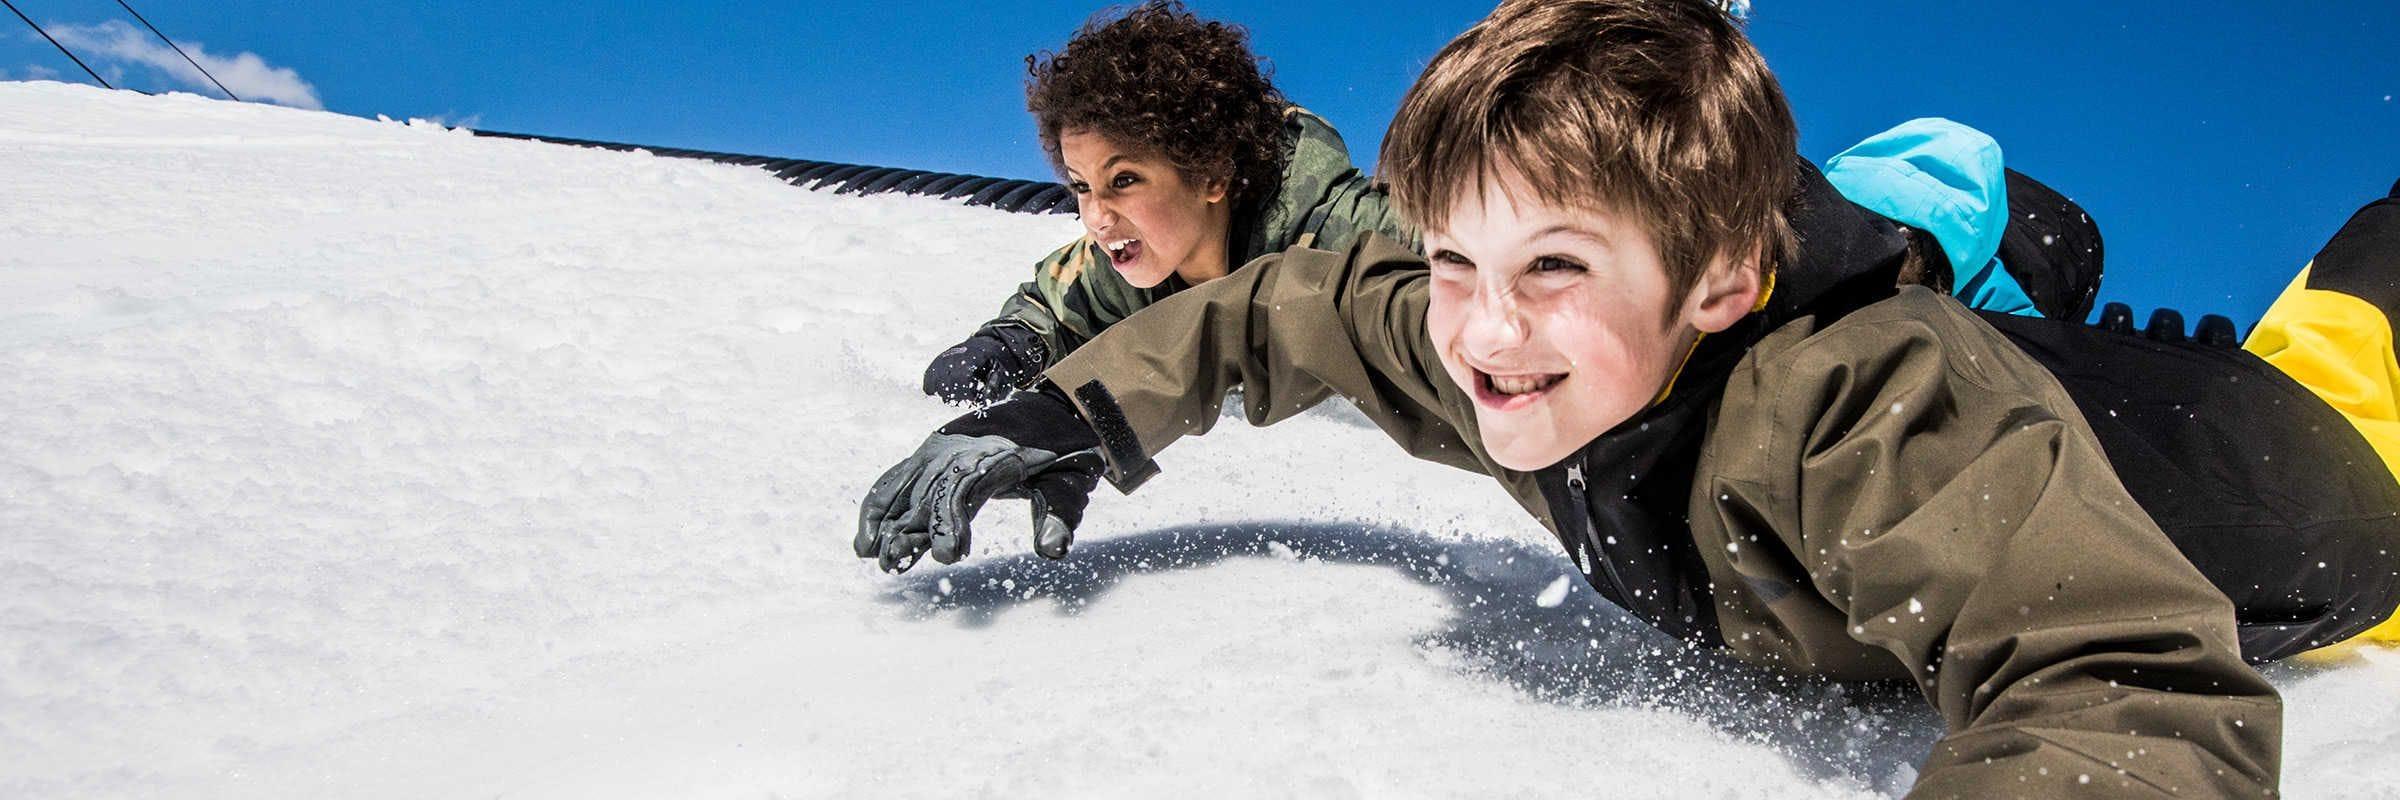 Burton, Camping, Canada Goose, Columbia Sportswear, down, Helly Hansen, Hiking & Trekking, Marmot, Patagonia, reima, Ski & Snowboard, The North Face, warm, Winter. 14 Best Kid's Winter Jackets